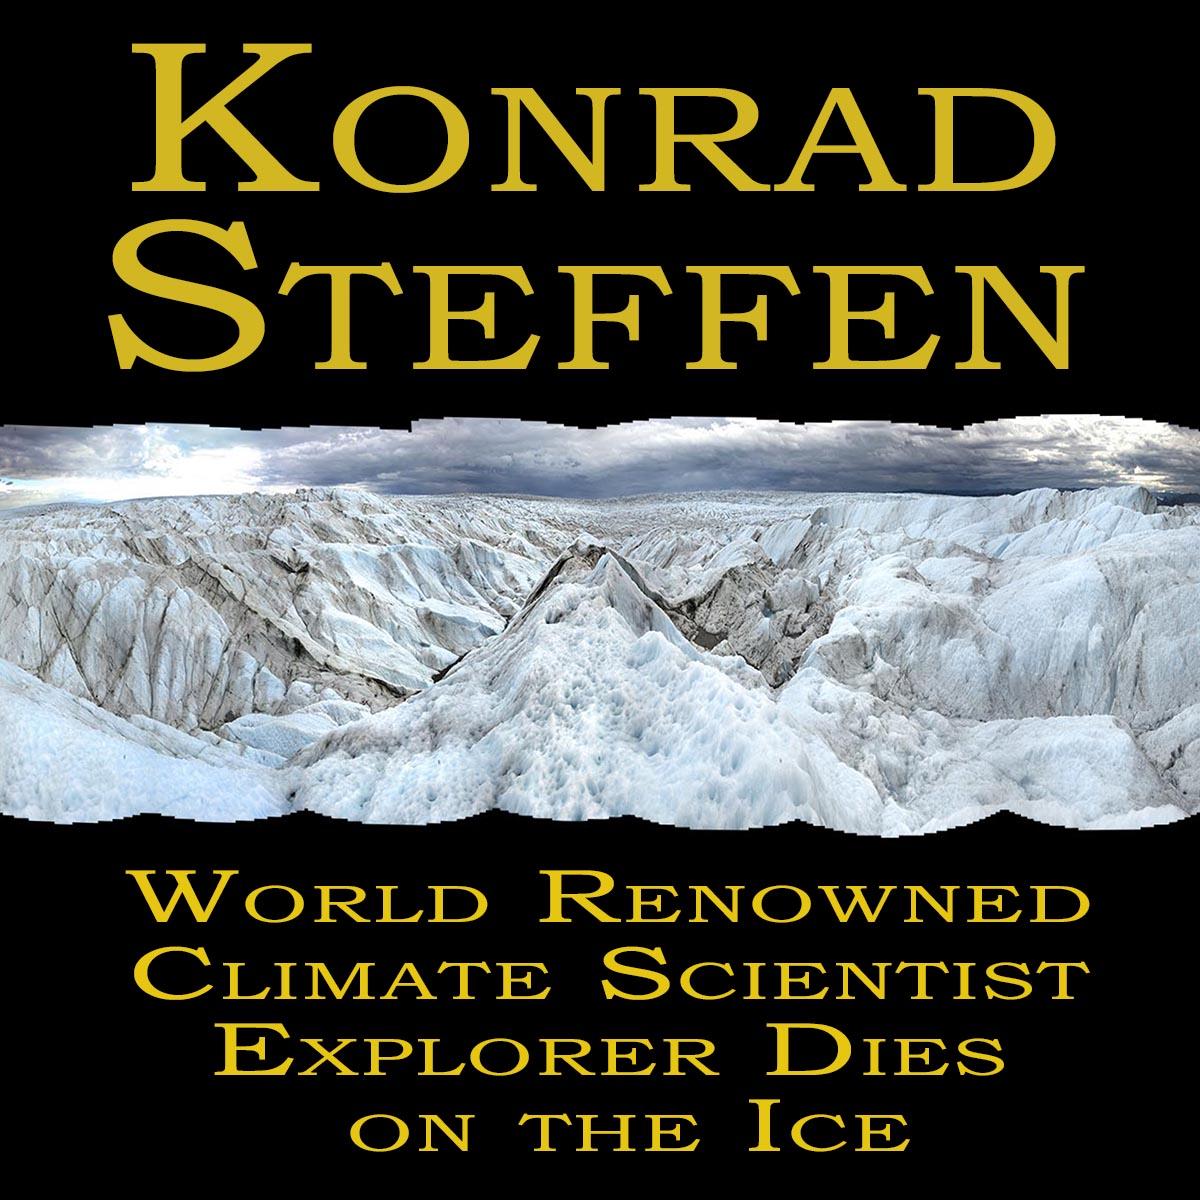 Renowned Climate Scientist Explorer Dies on the Ice: Konrad Steffen